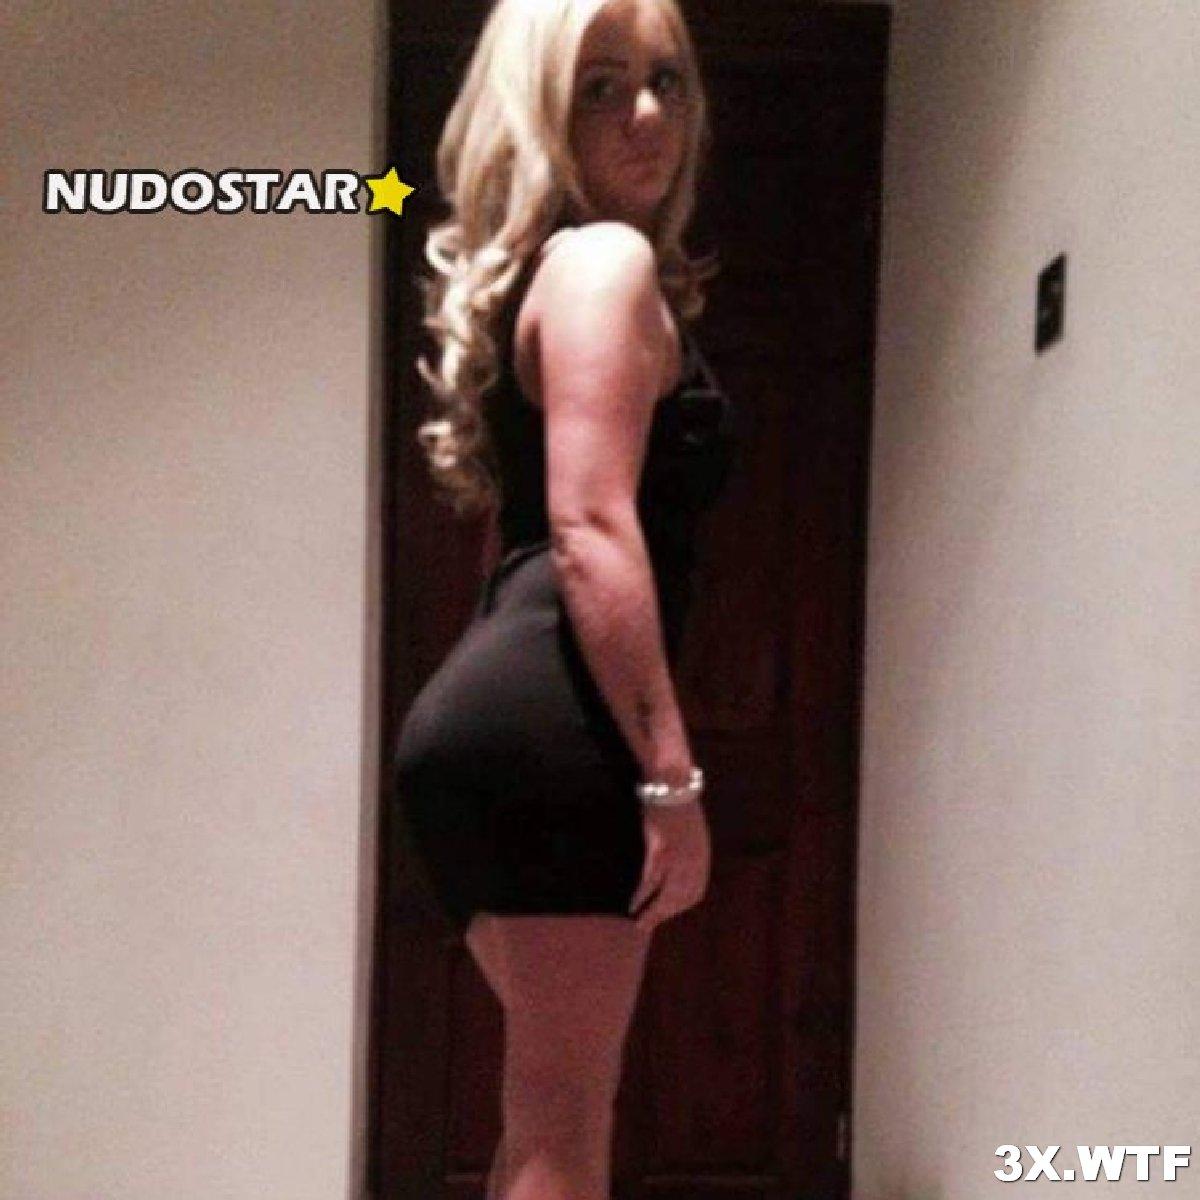 Kate Louise Girlnextdoorr Admireme Nudes Leaks 0013